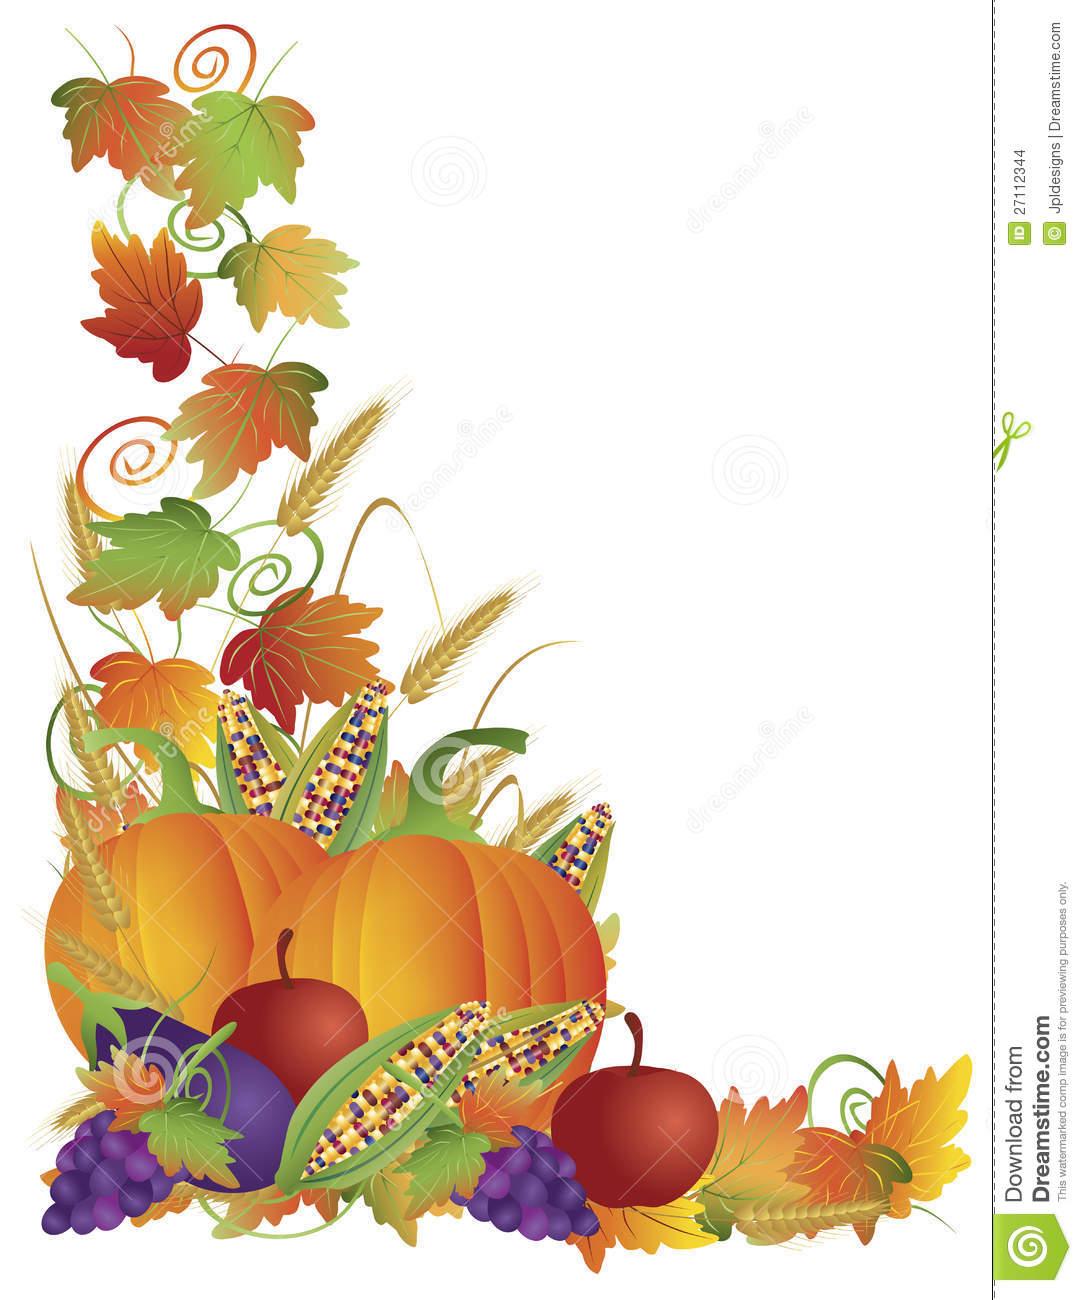 Fall Festival Wallpaper 7 Best Images Of Free Printable Fall Harvest Borders